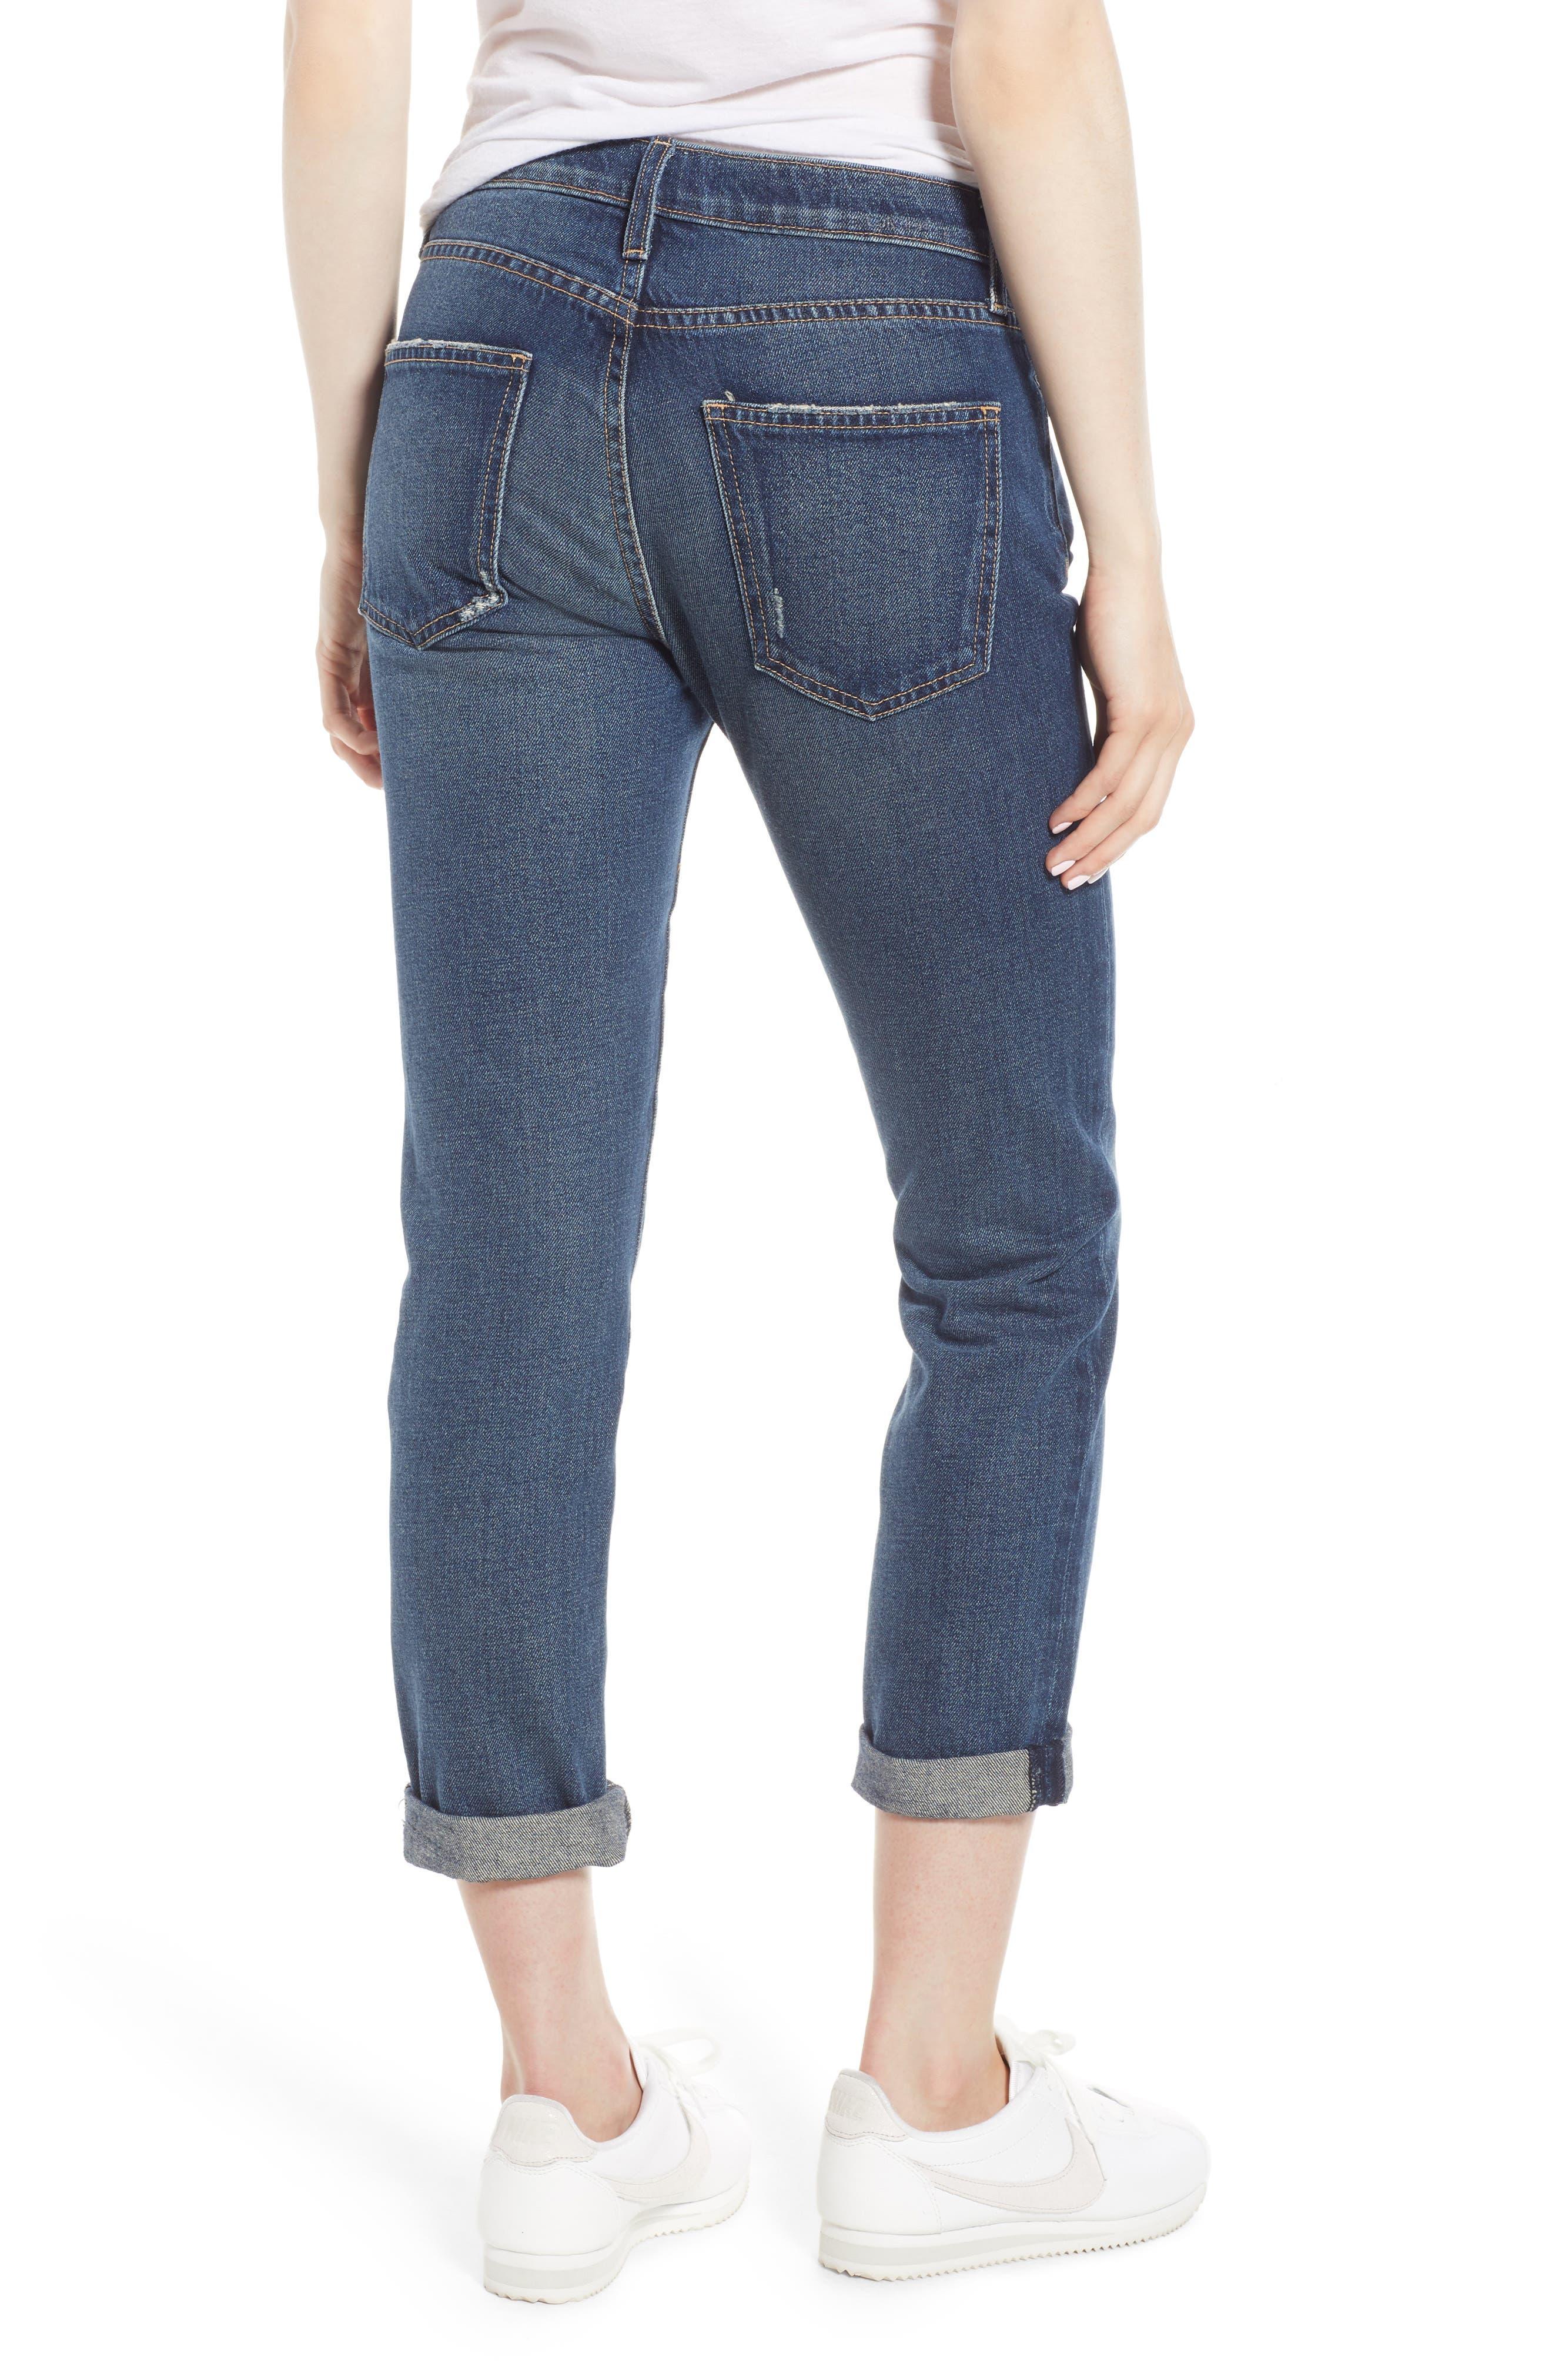 9db114a5a35 Women's Current/Elliott Jeans & Denim | Nordstrom